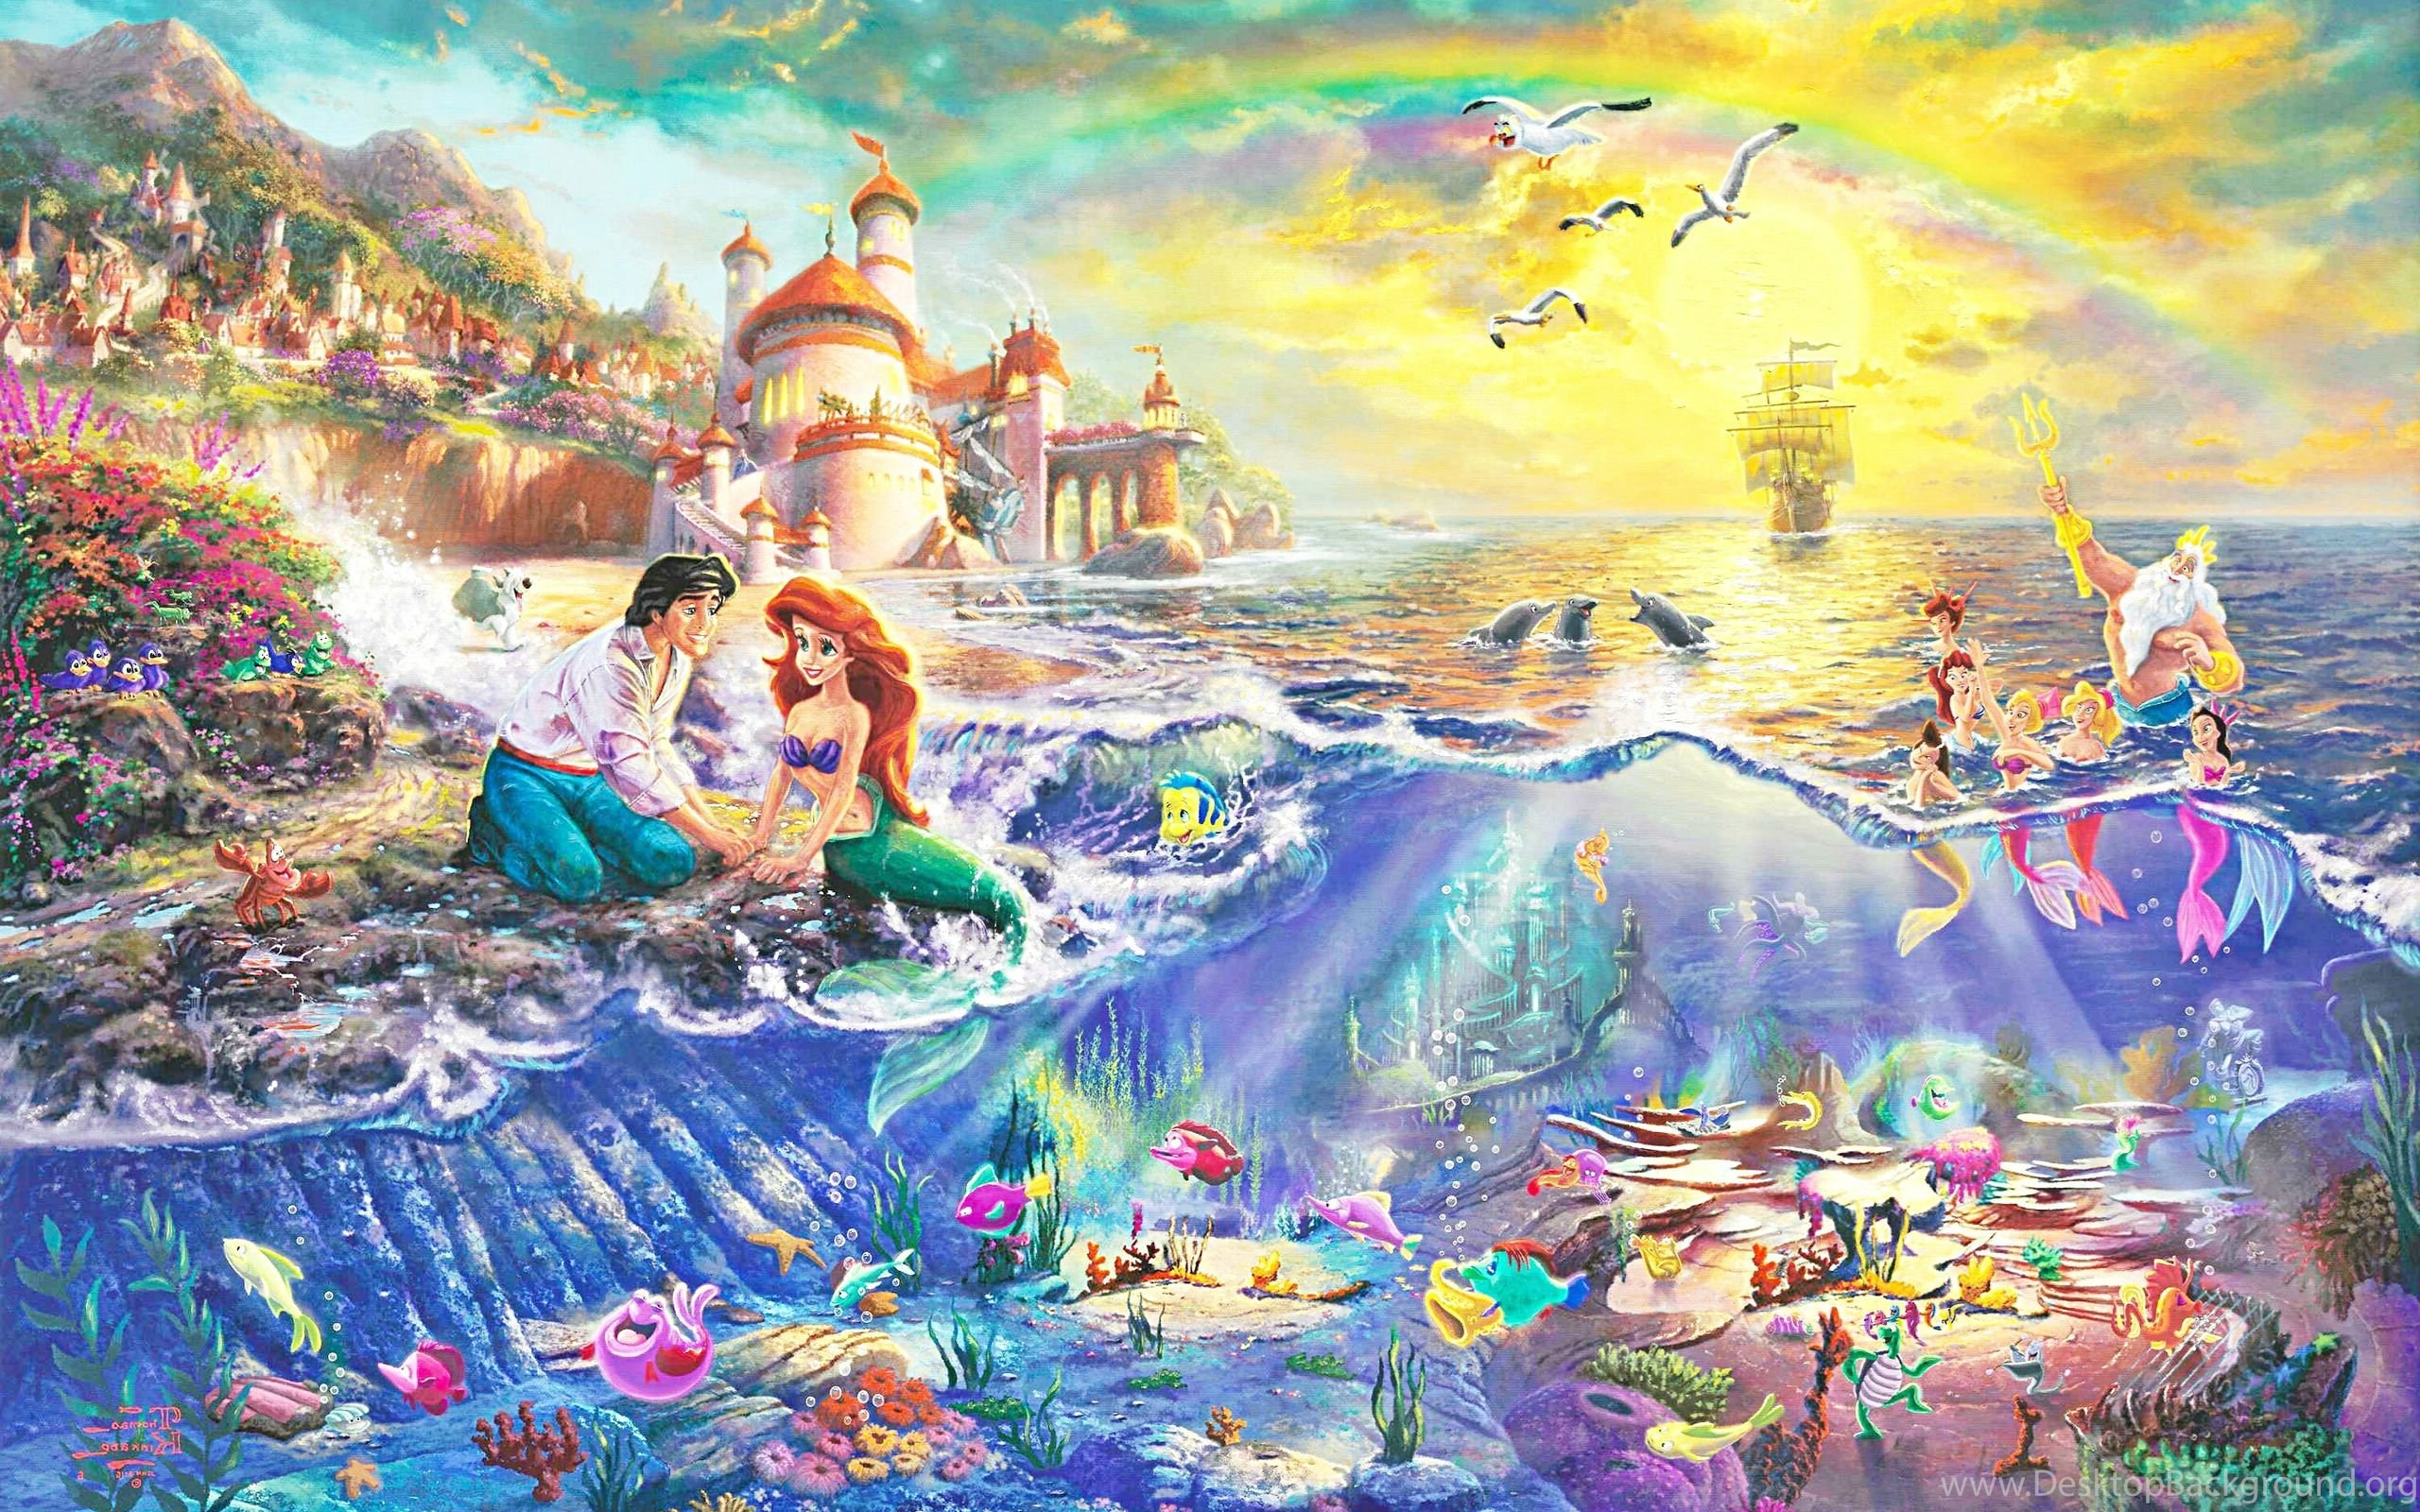 Adventure Time Wallpaper Iphone X Little Mermaid Disney Fantasy Animation Cartoon Adventure